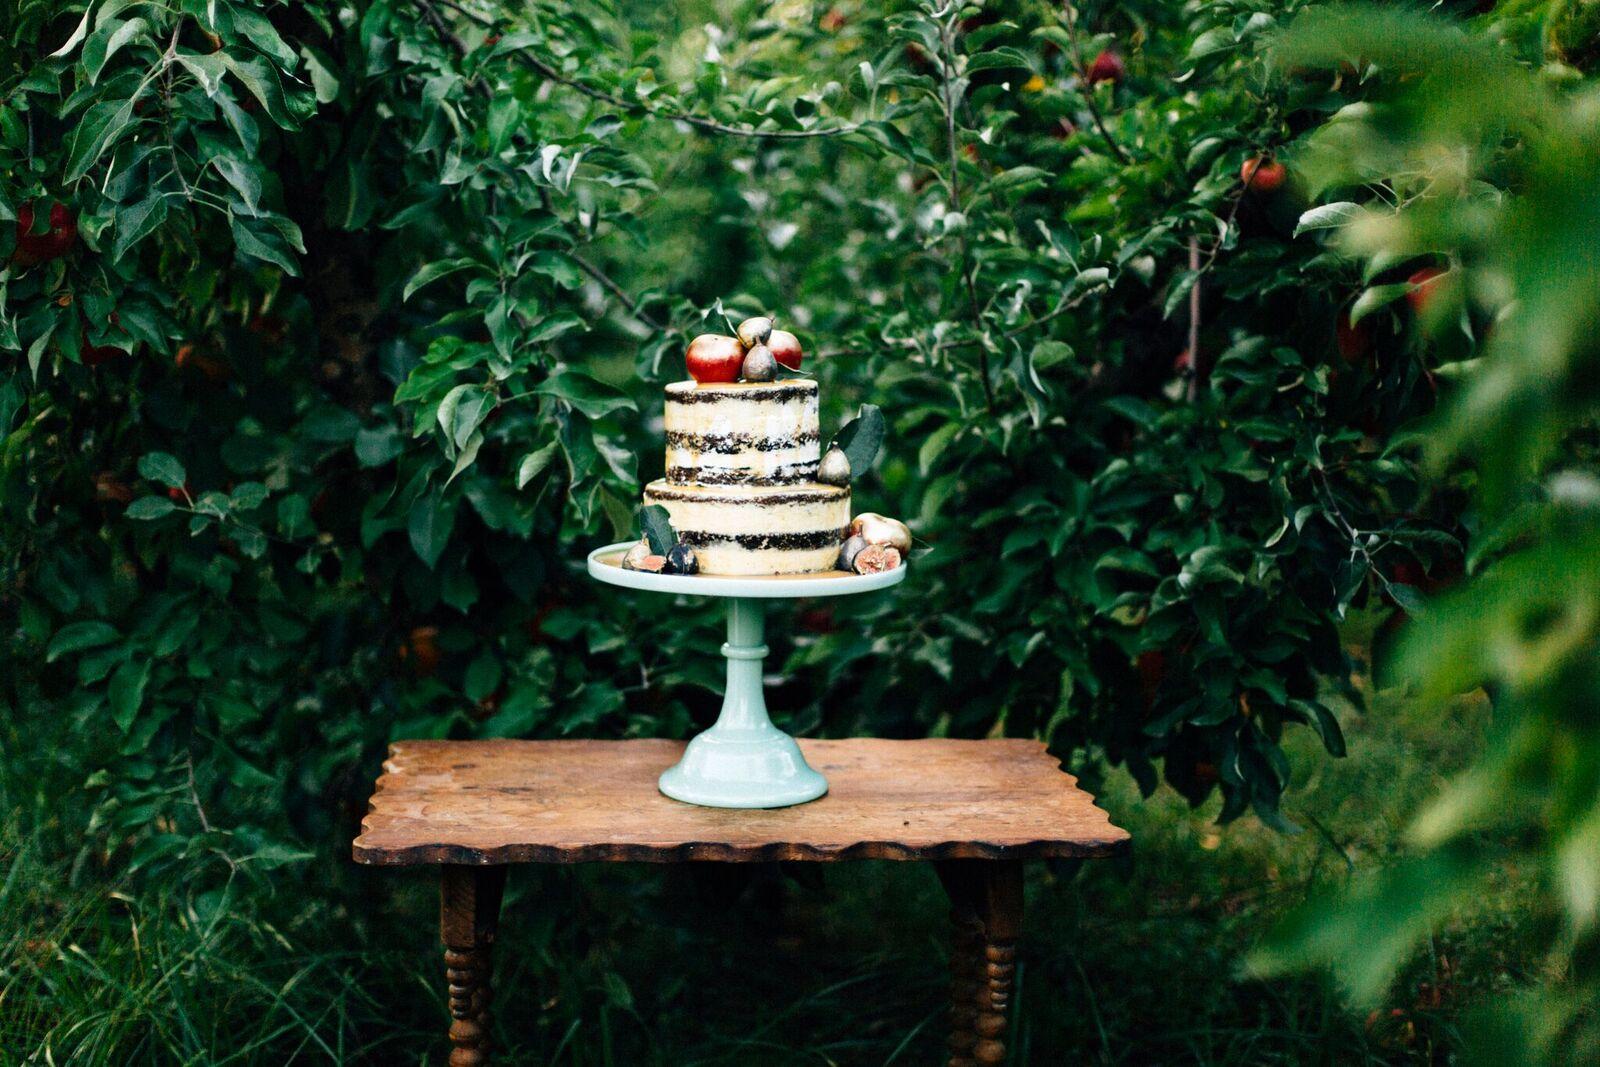 The Sassy Cupcake || Dawn Photography